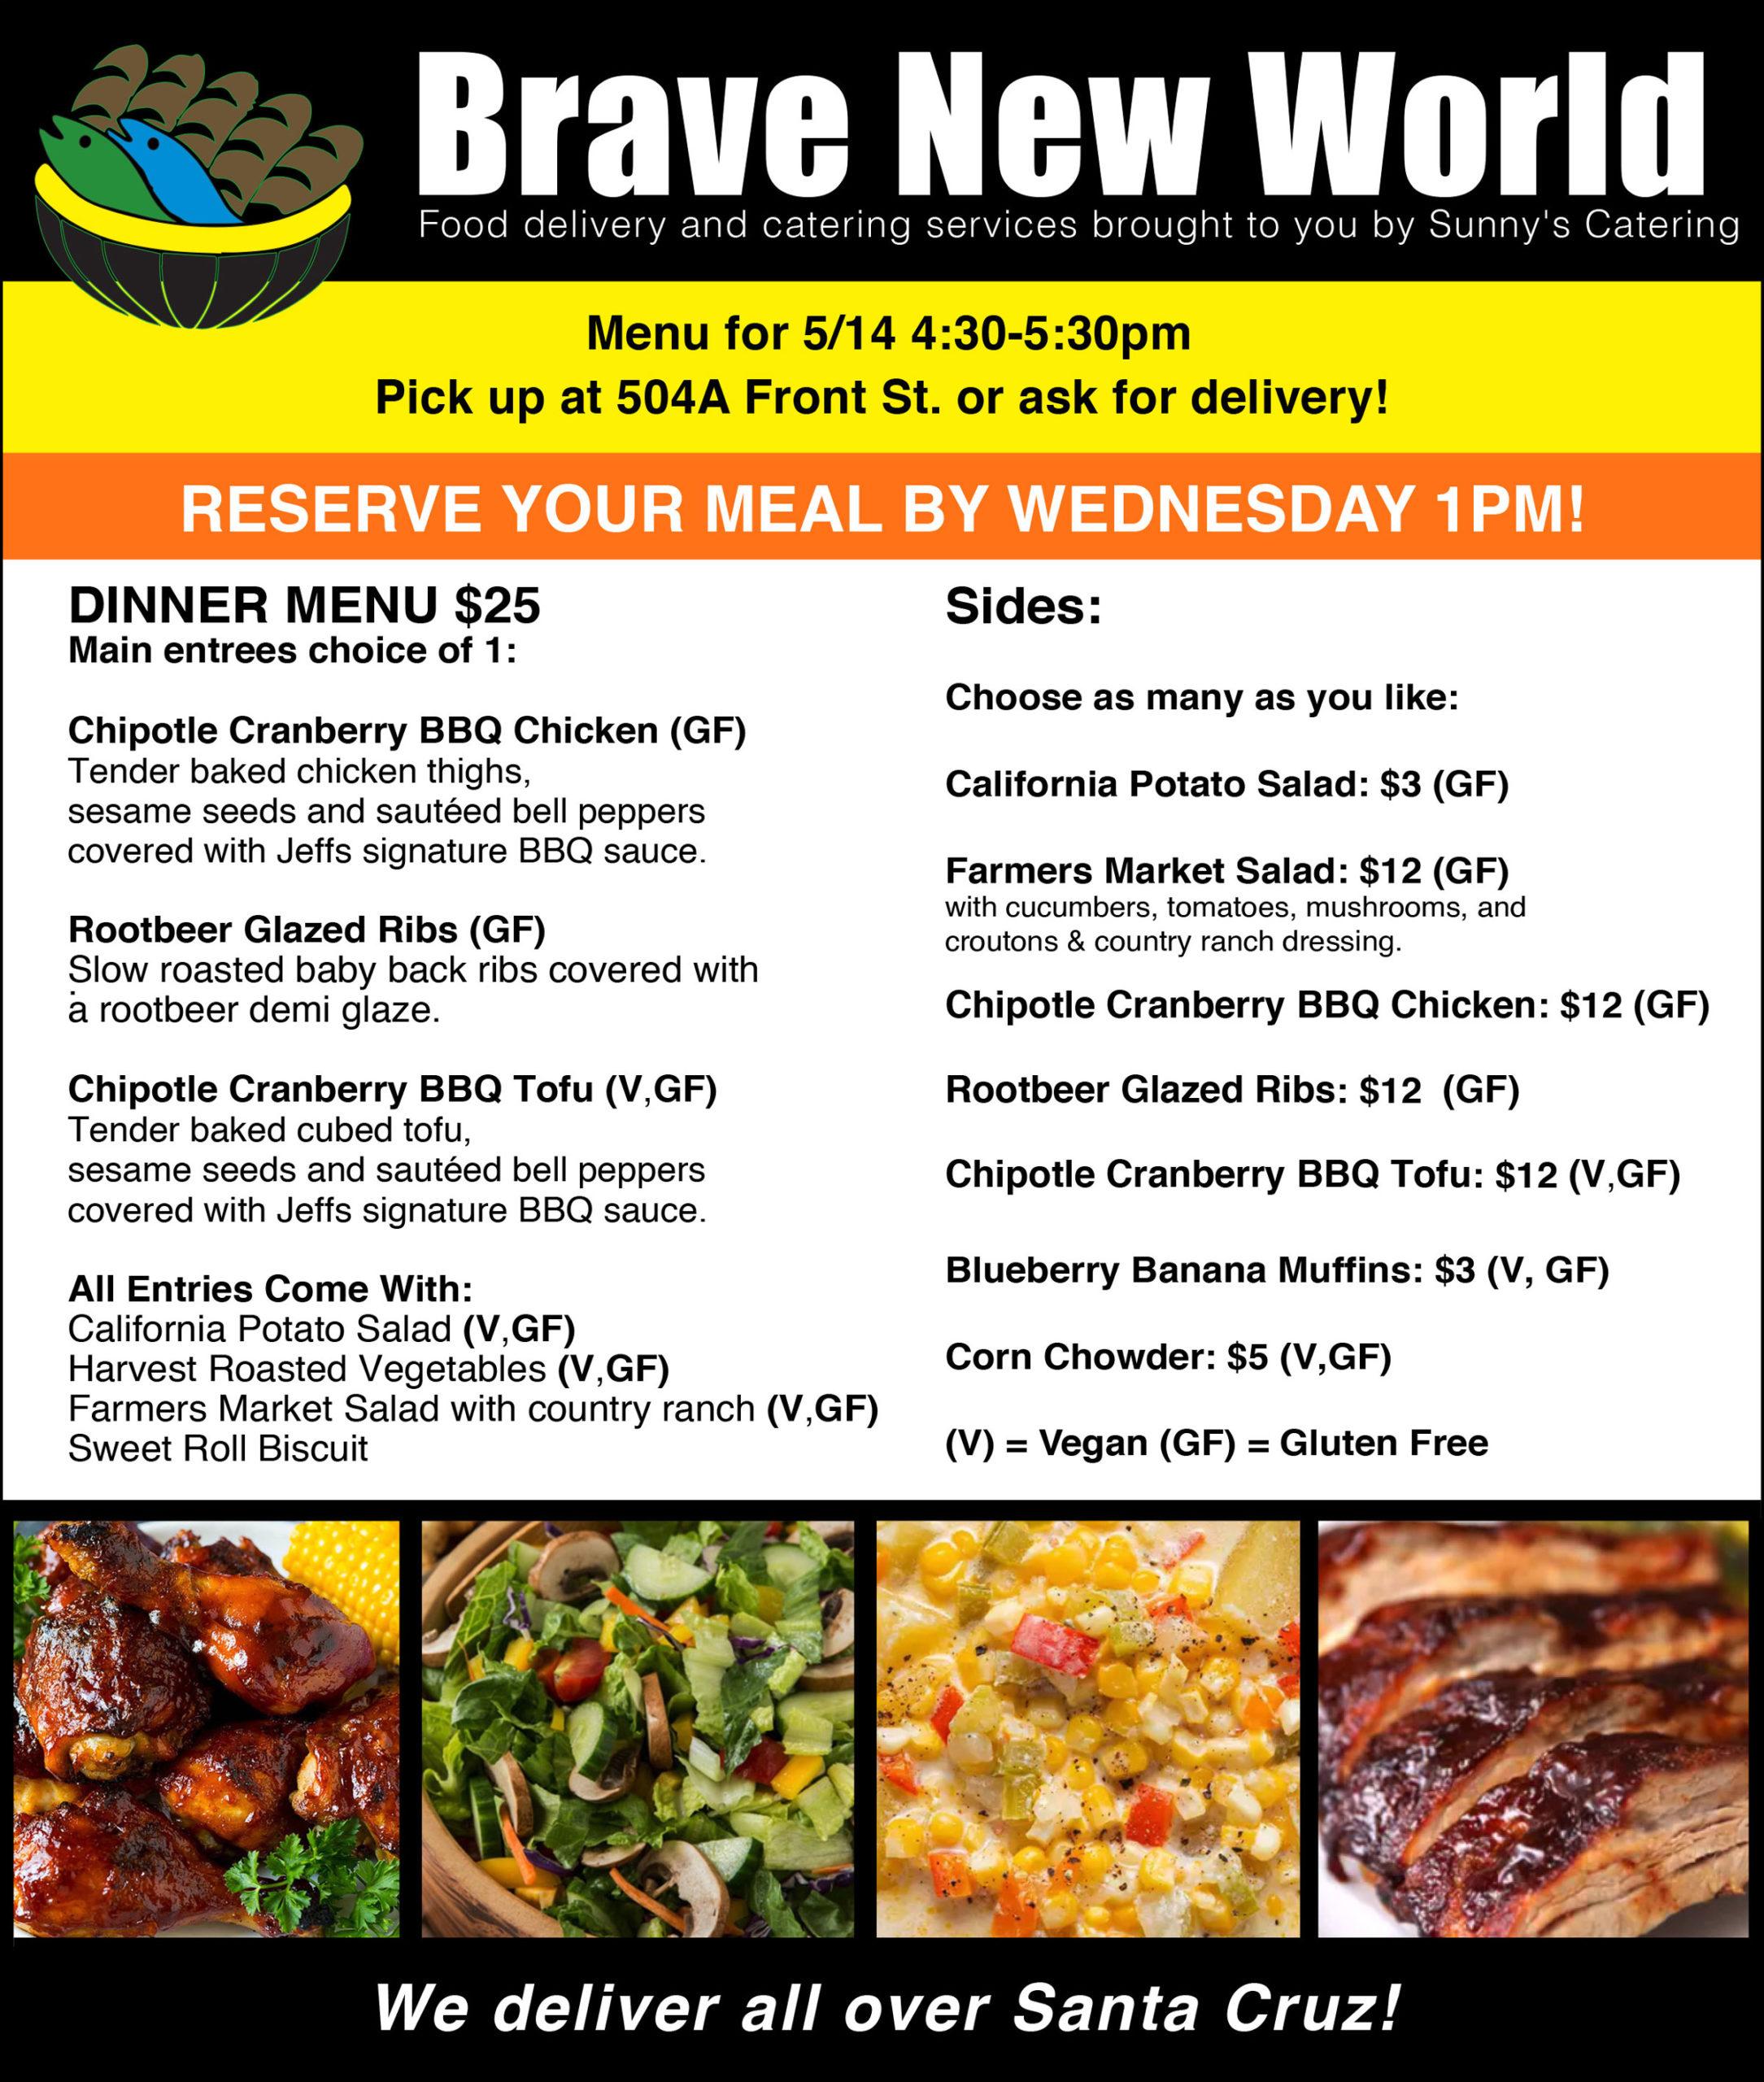 Brave New World Weekly Meals in Santa Cruz, CA